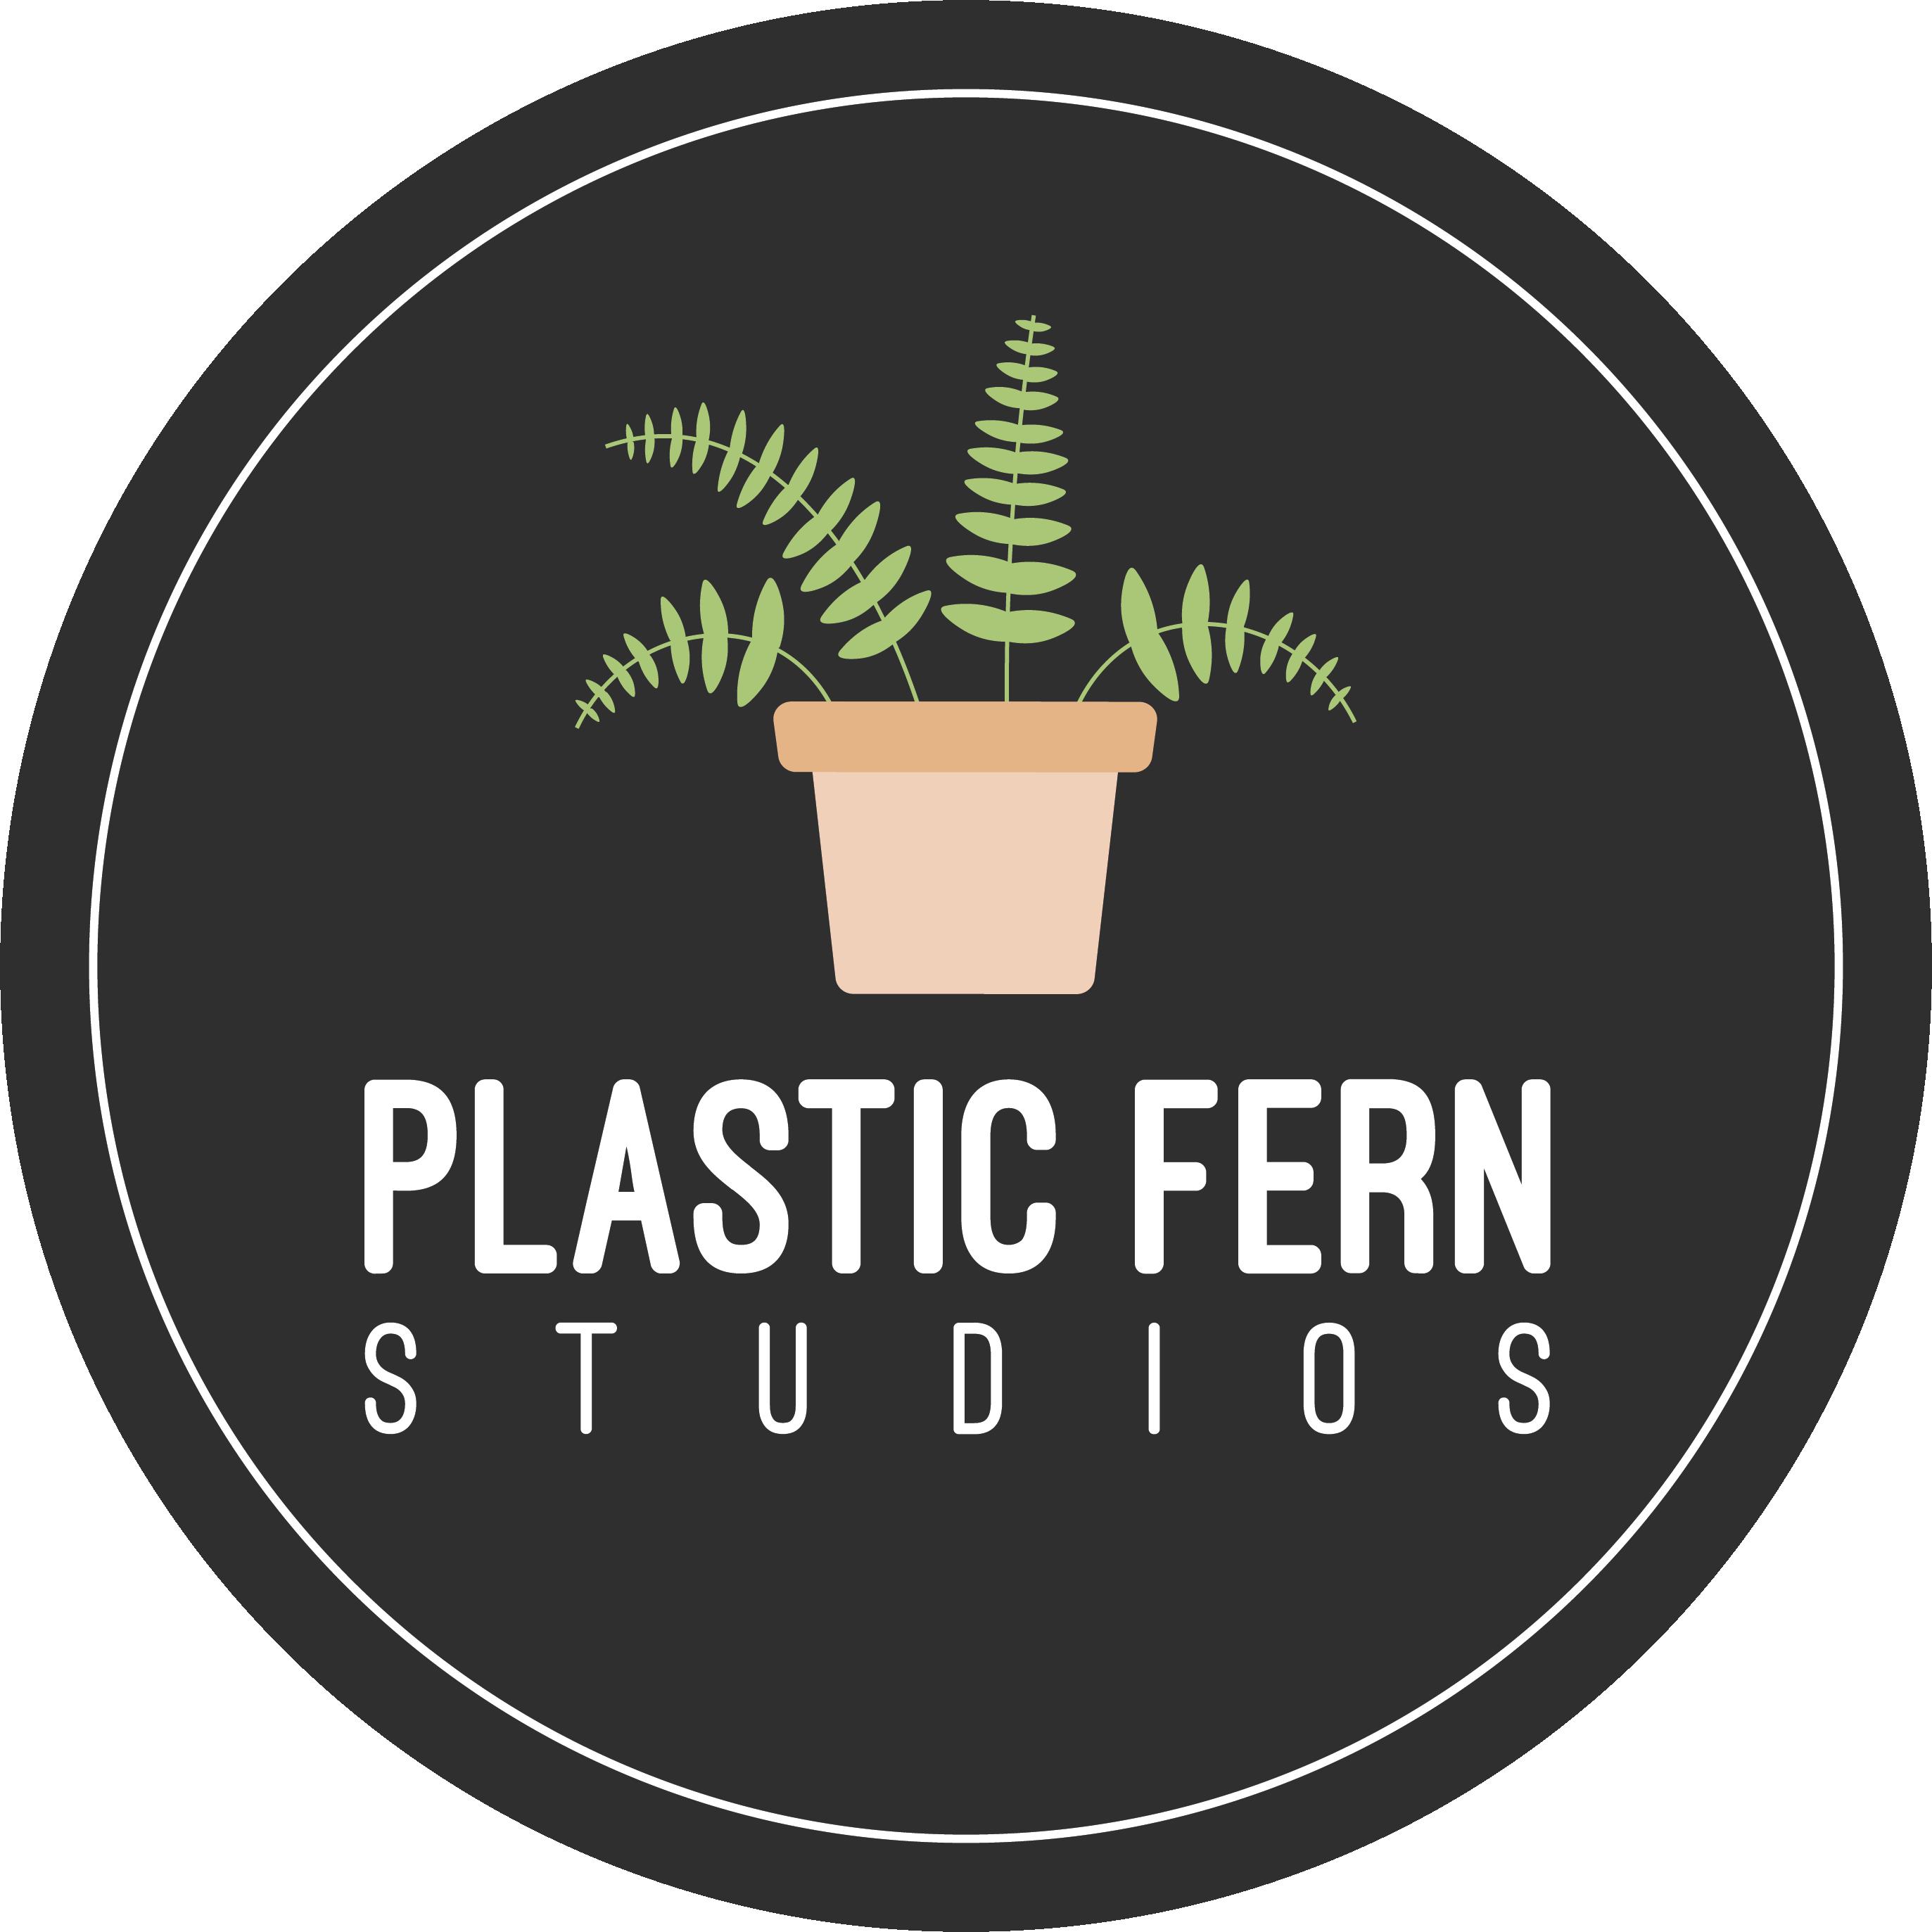 Plastic Fern